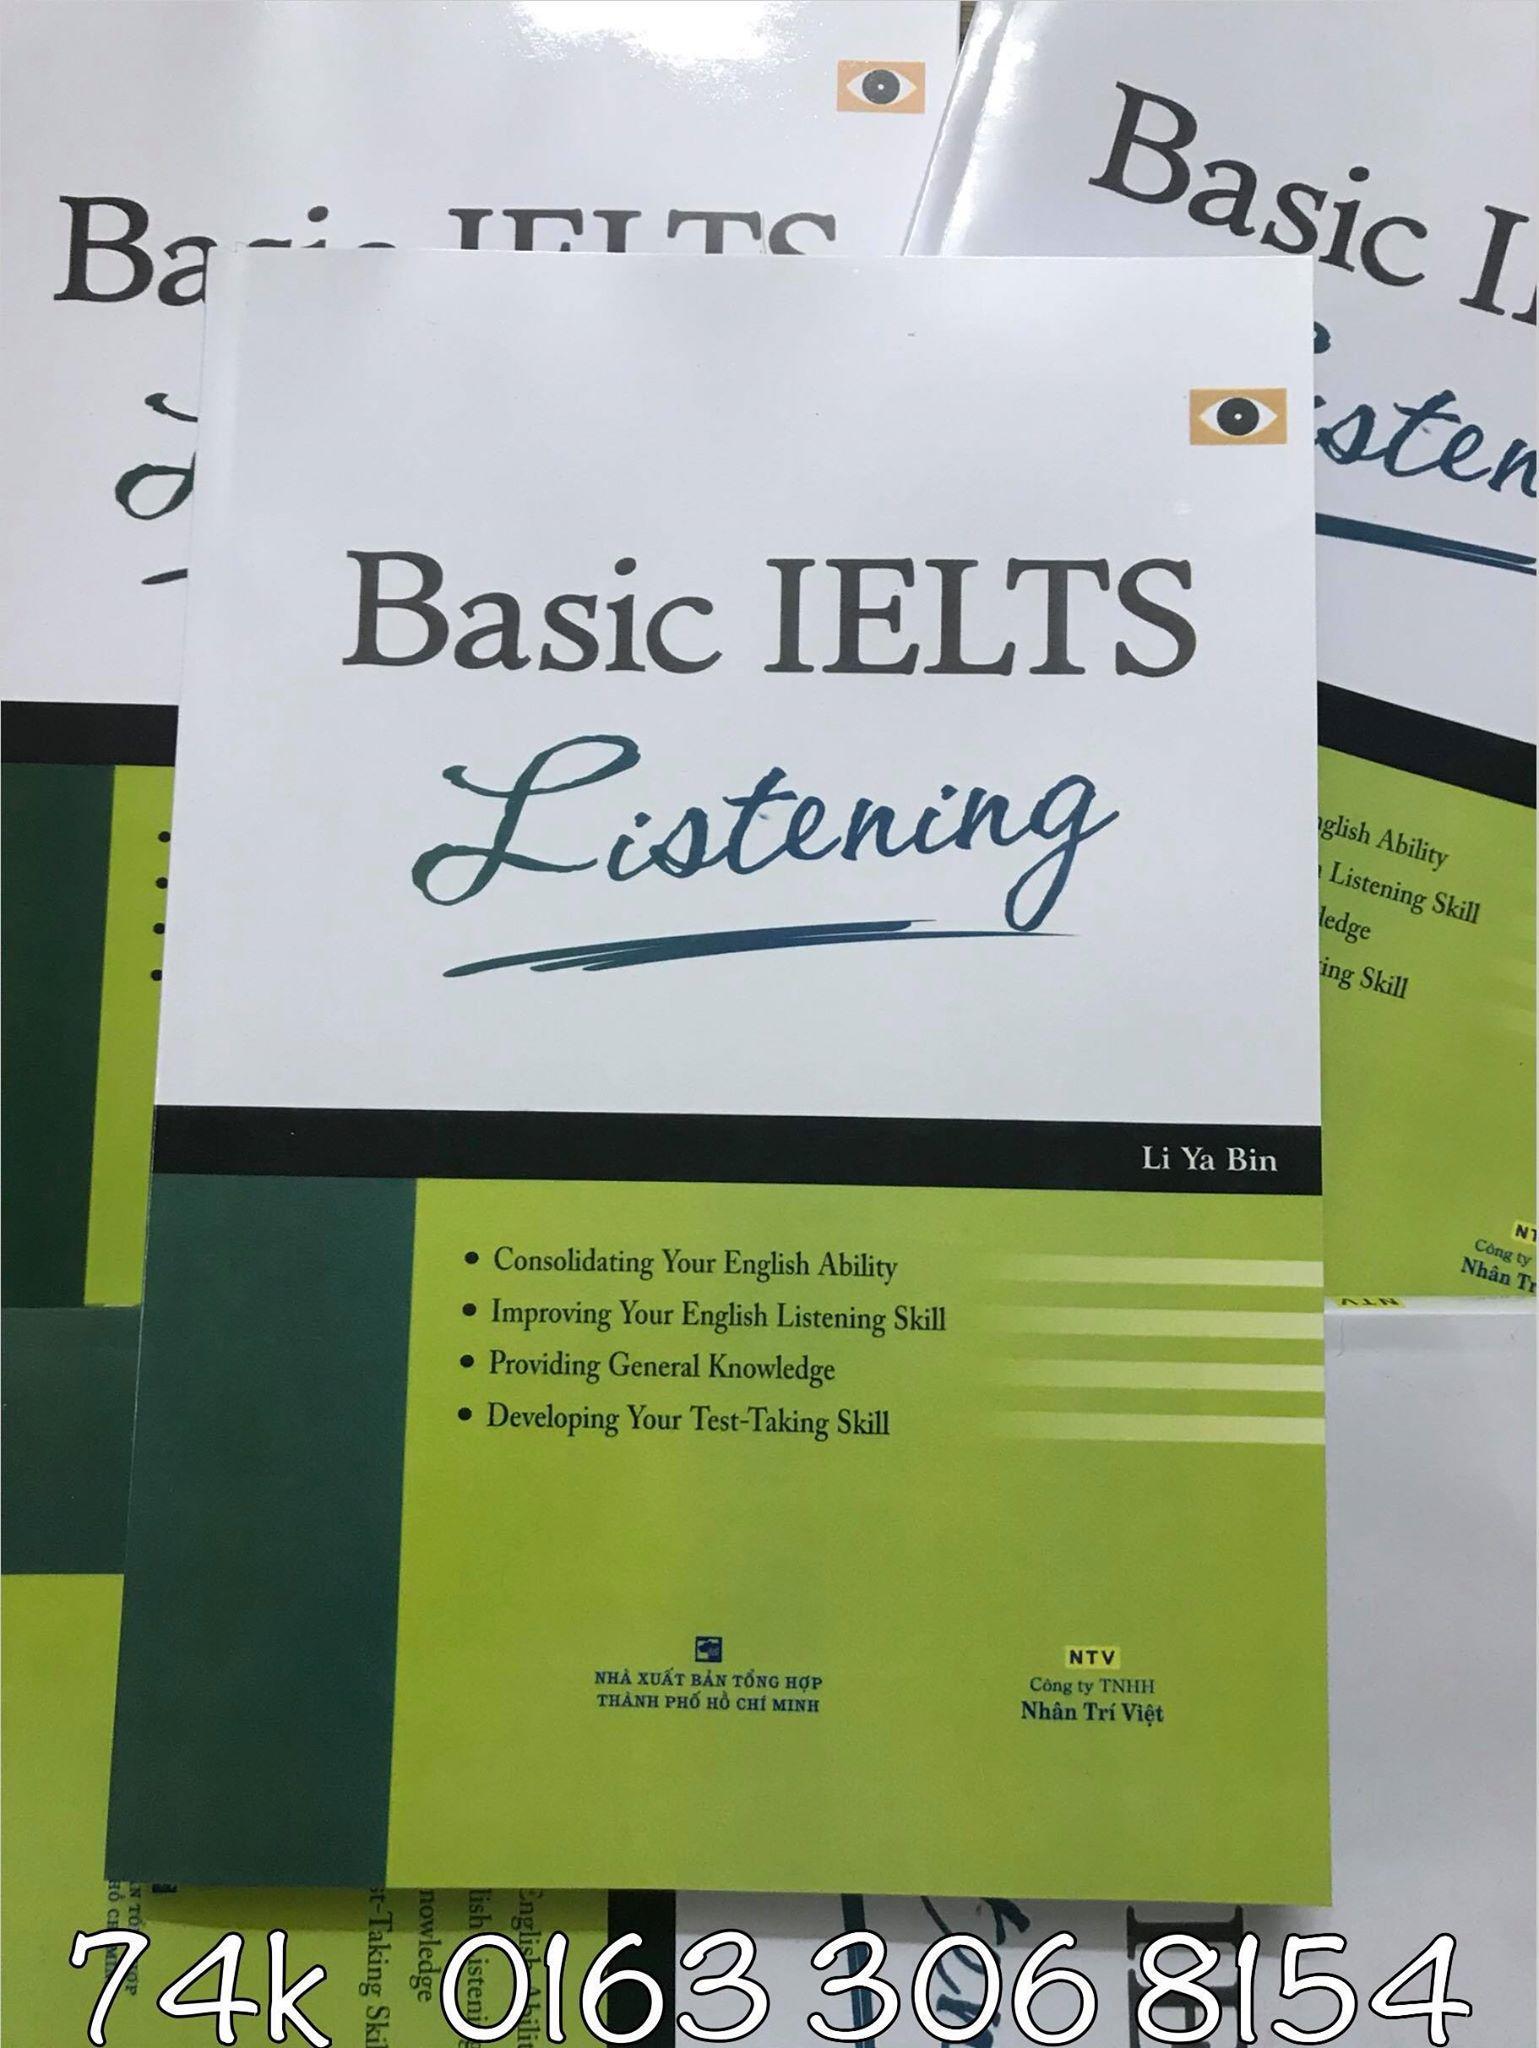 Giá Quá Tốt Để Có IELTS -  Basic Ielts - Listening